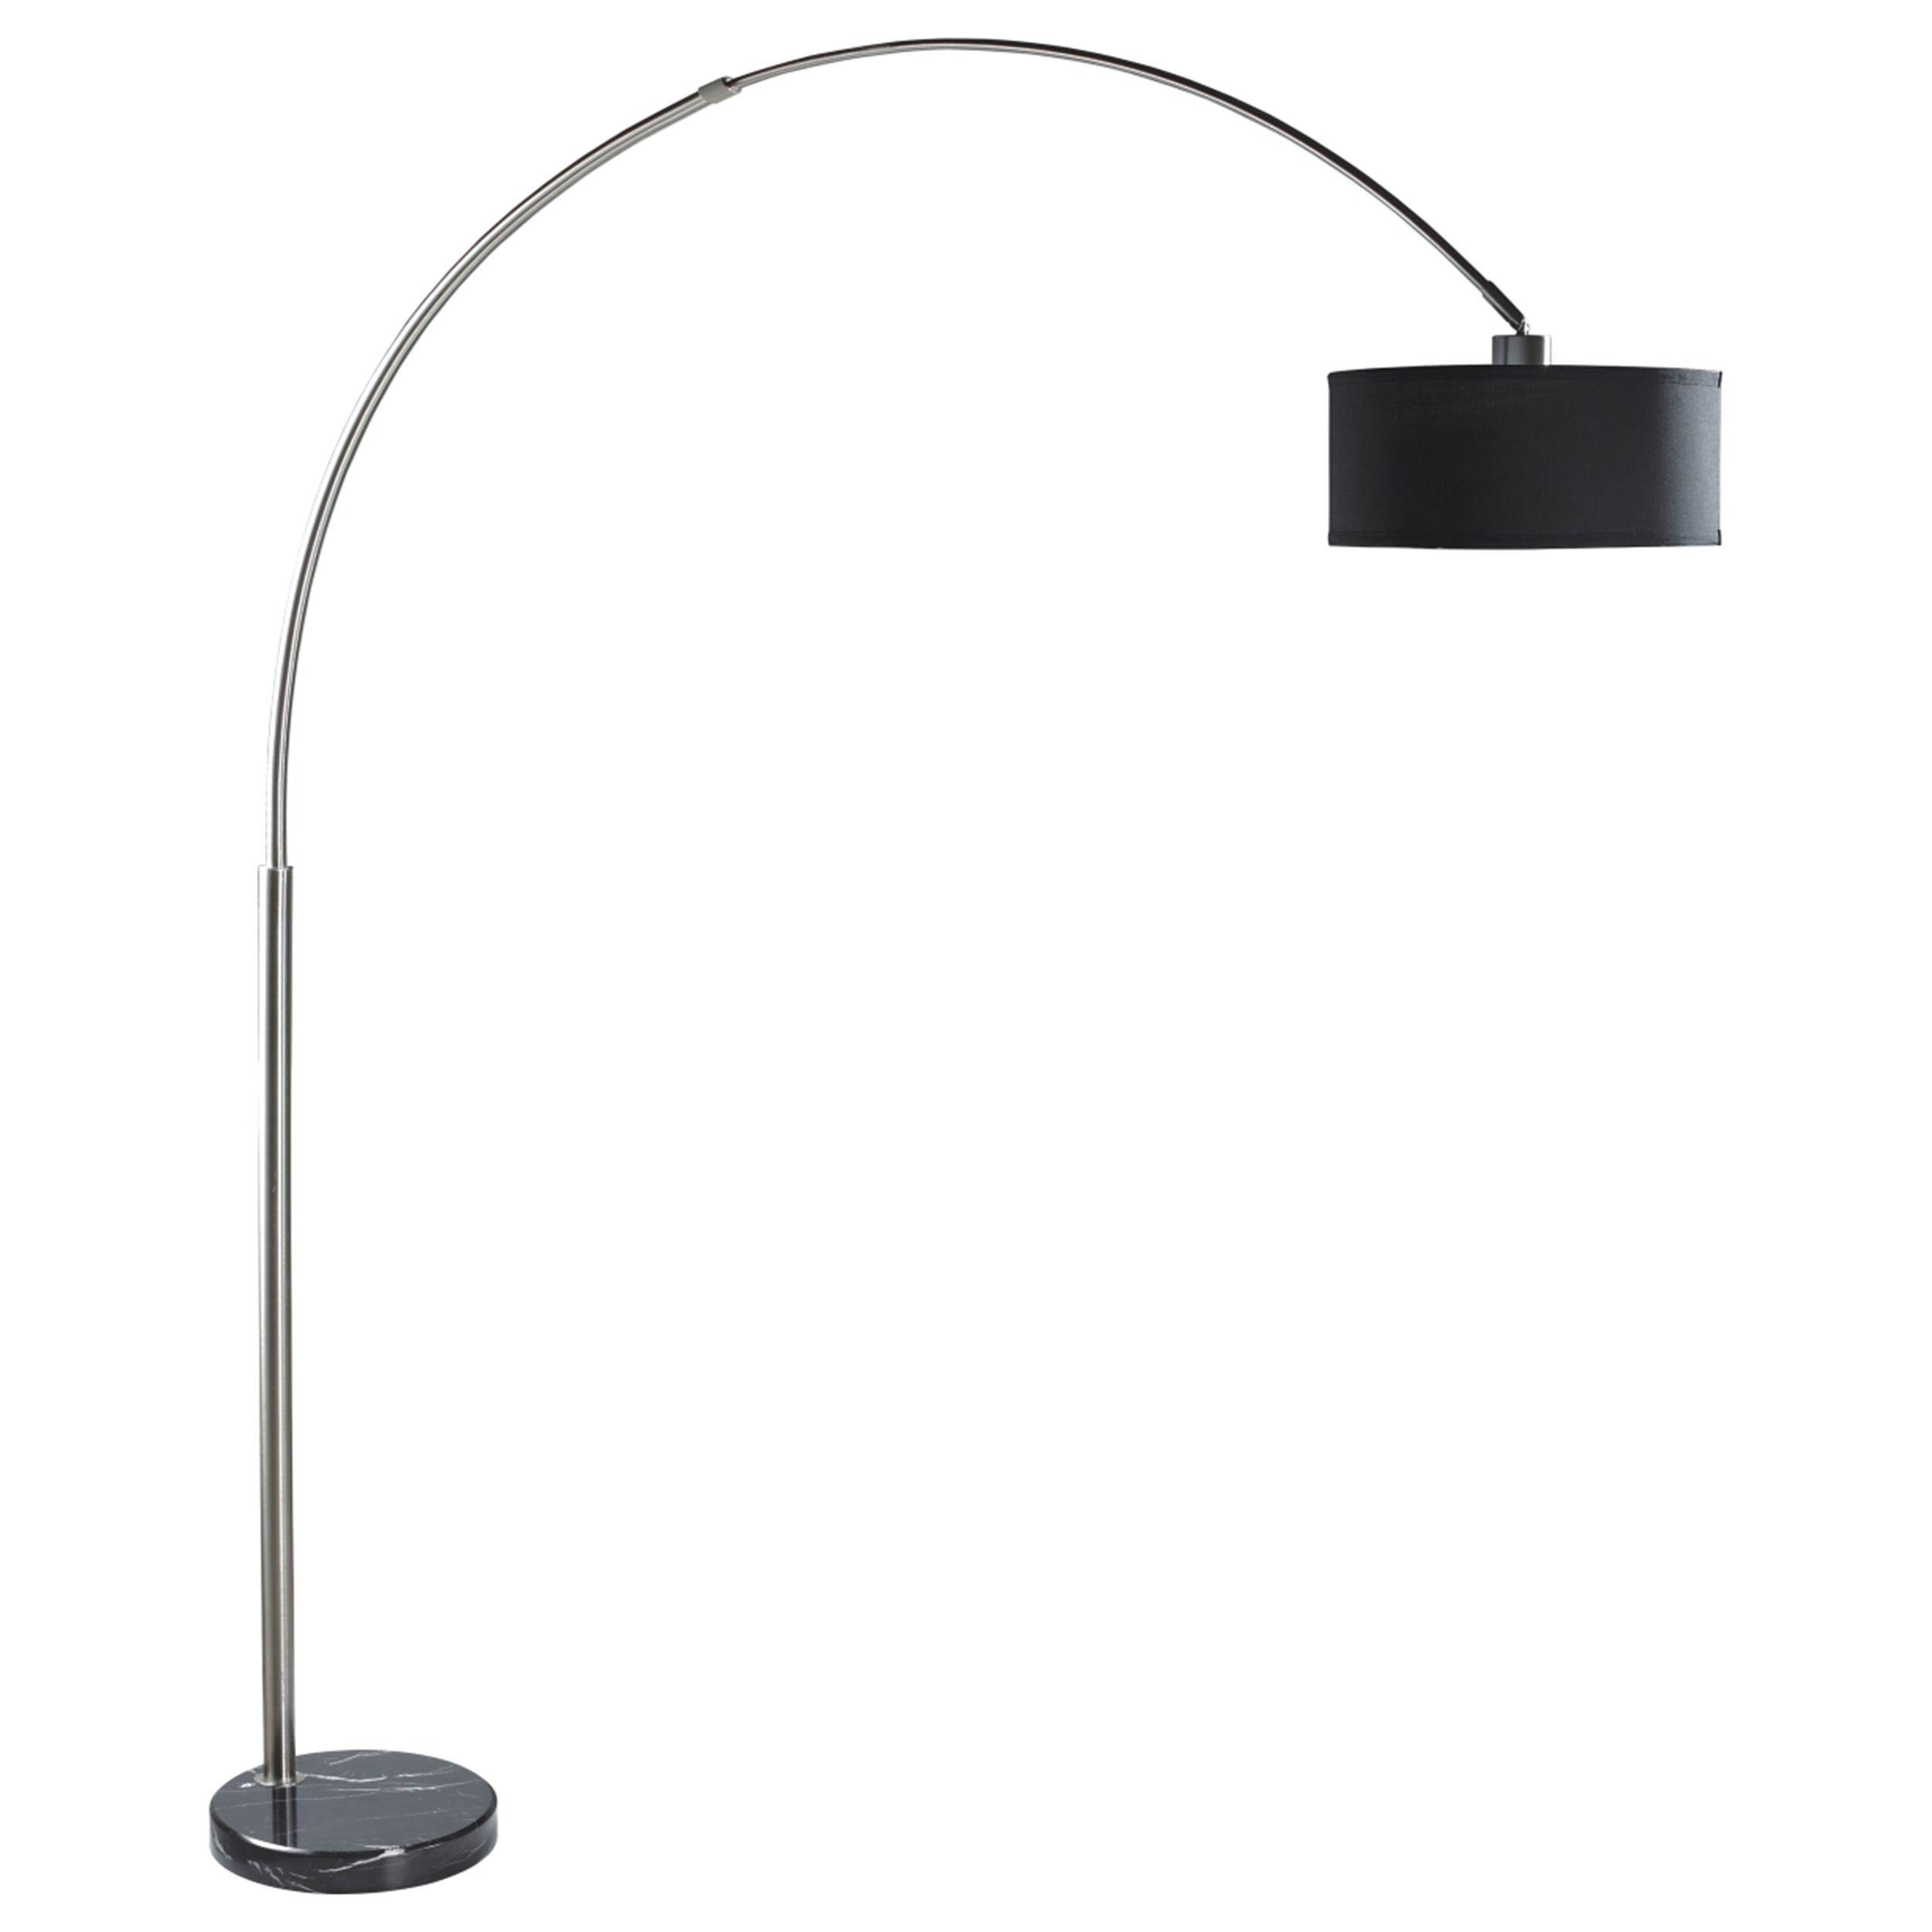 journee lighting. journee home \u0027city lights\u0027 81 inch modern arch floor lamp (black) ( lighting e